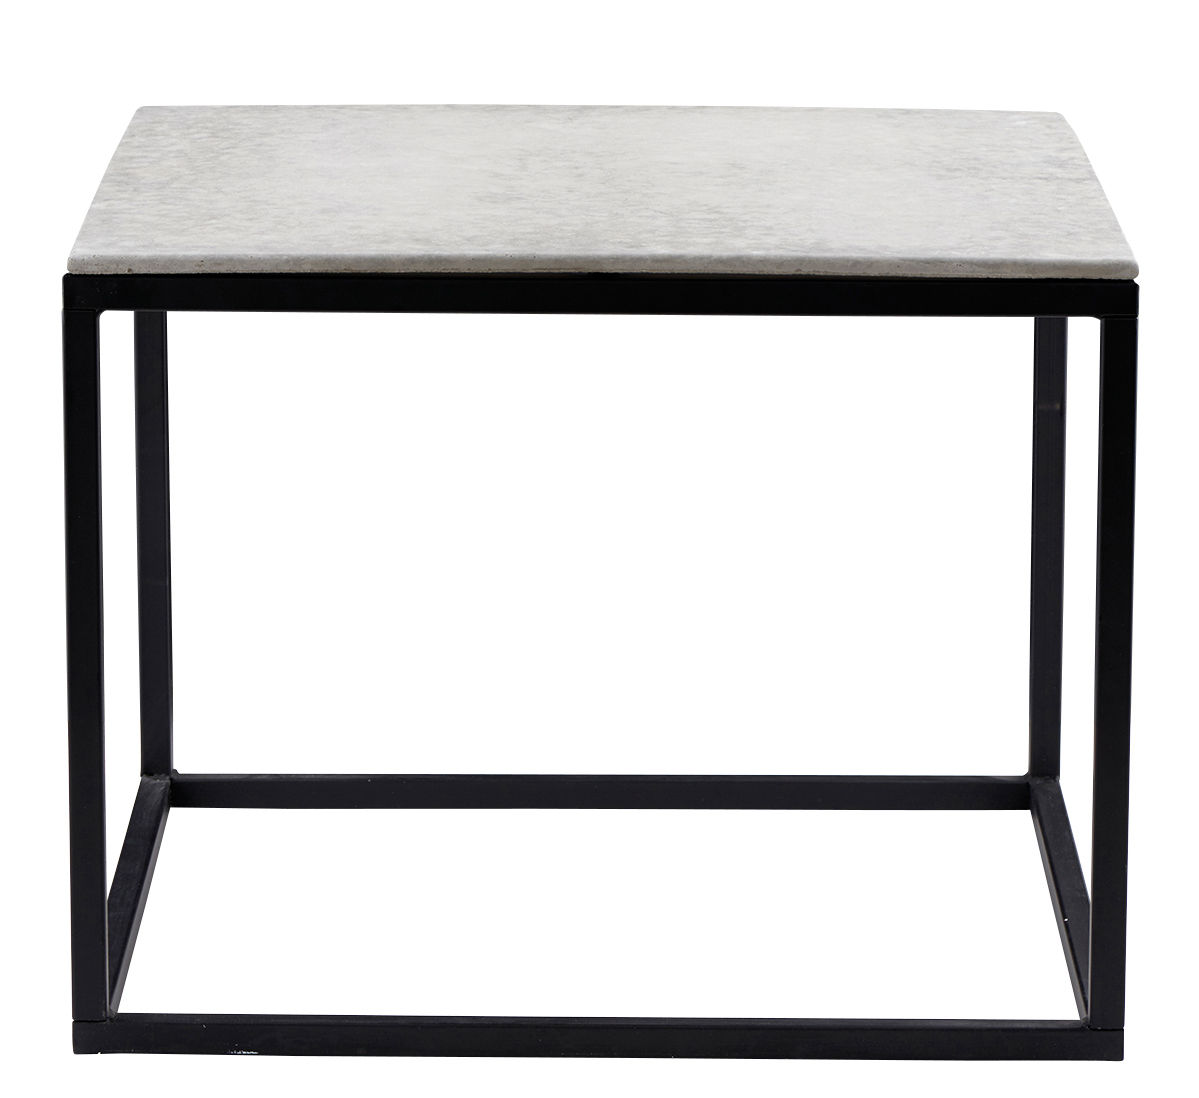 table basse plateau b ton 60 x 60 cm plateau b ton. Black Bedroom Furniture Sets. Home Design Ideas